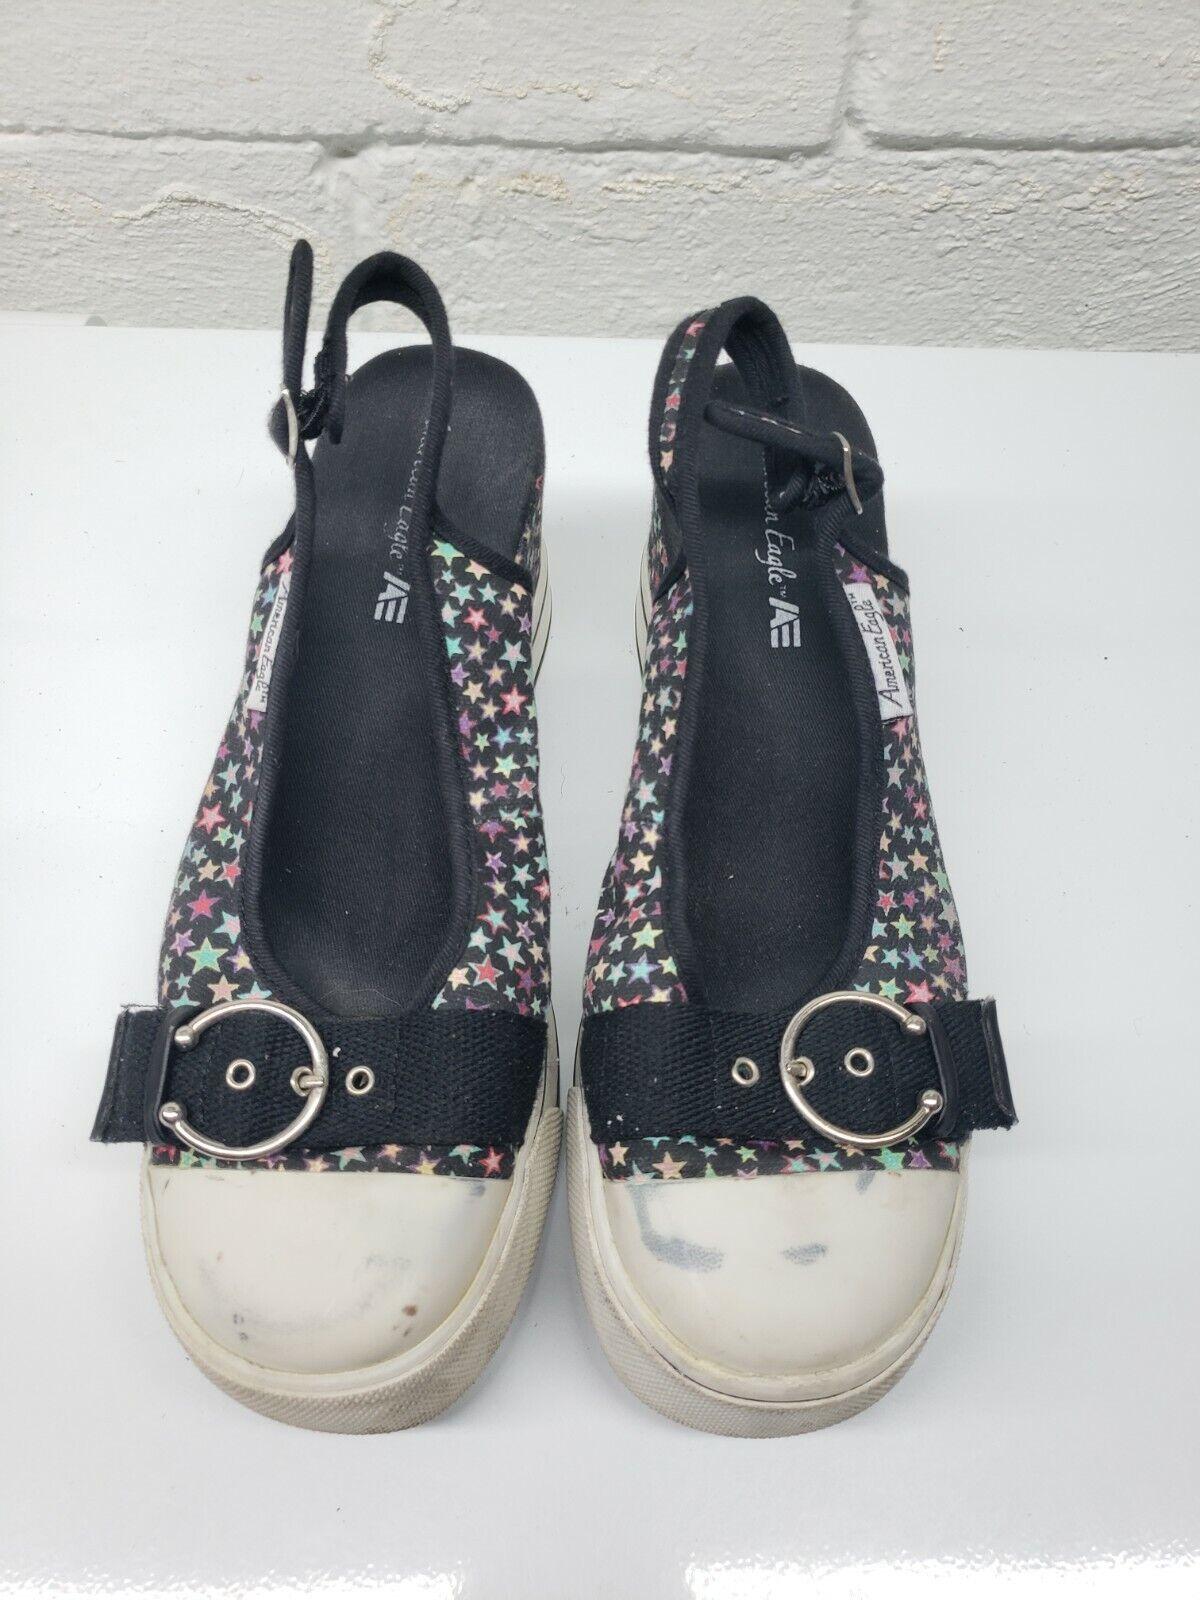 American Eagle Womens Comfort Round Toe Slingback Black Sandals Size 8.5 63071